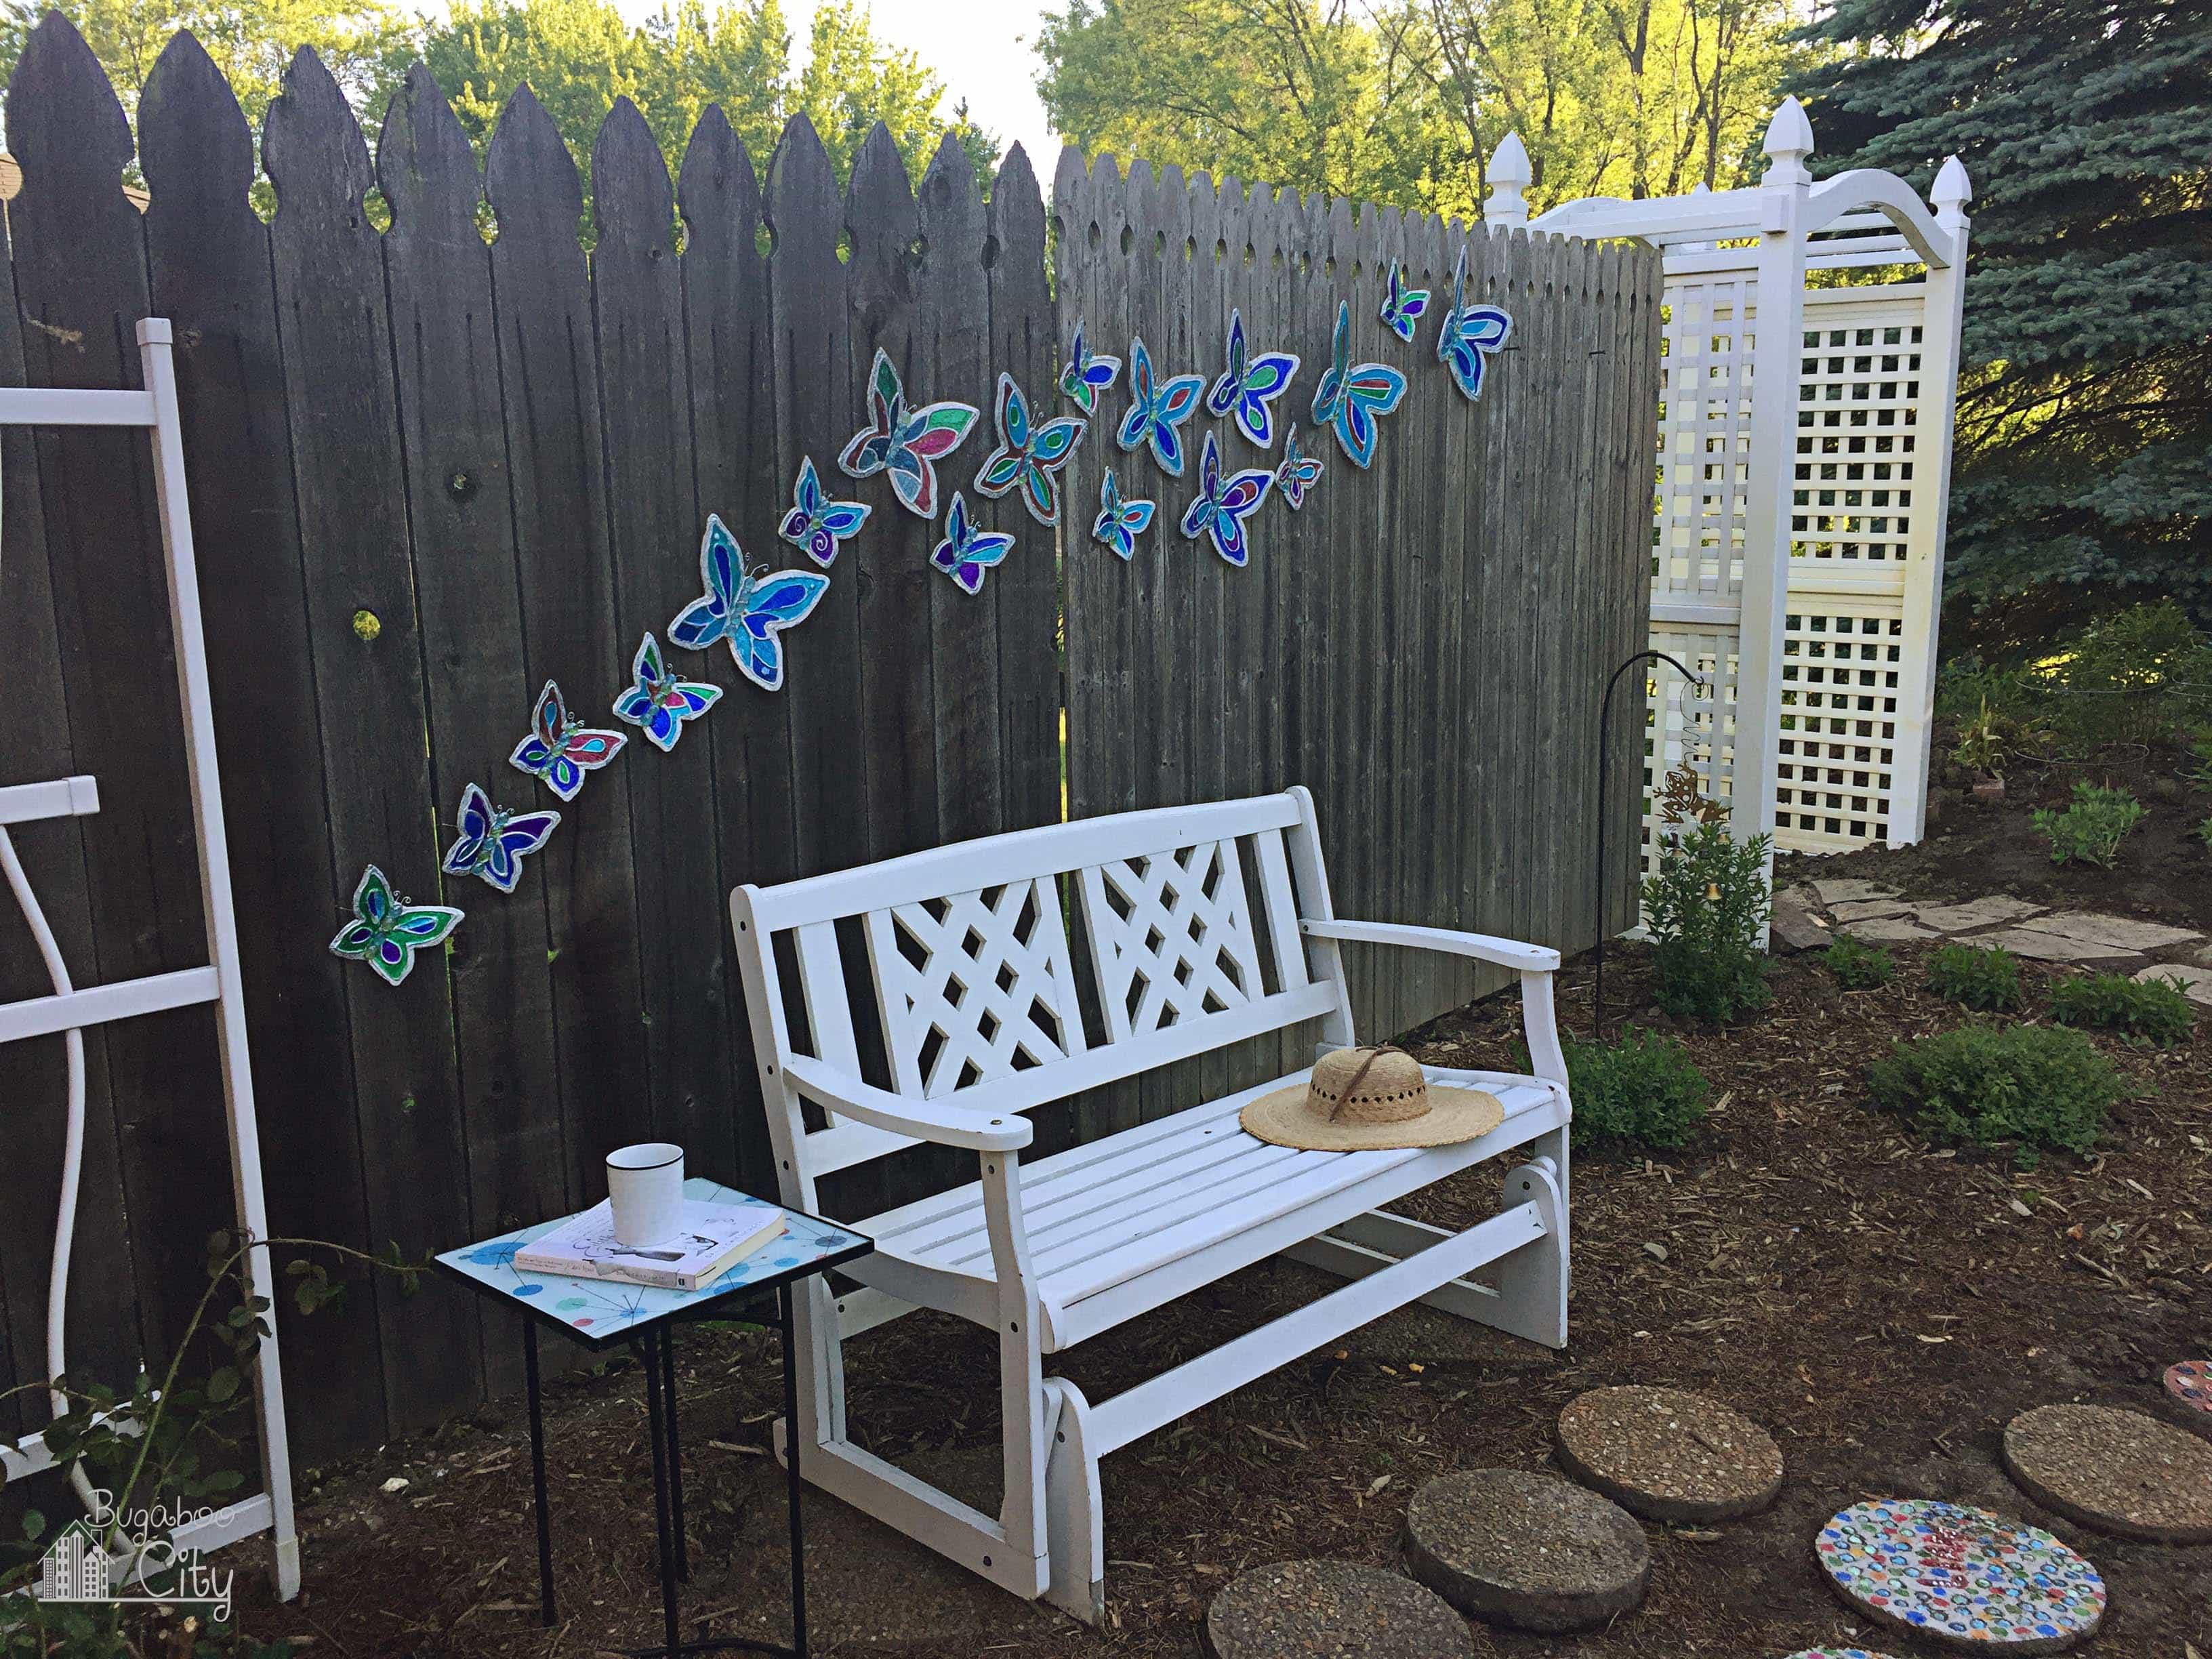 Diy butterfly garden ornament bugaboocity diy butterfly lawn ornament tutorial solutioingenieria Gallery